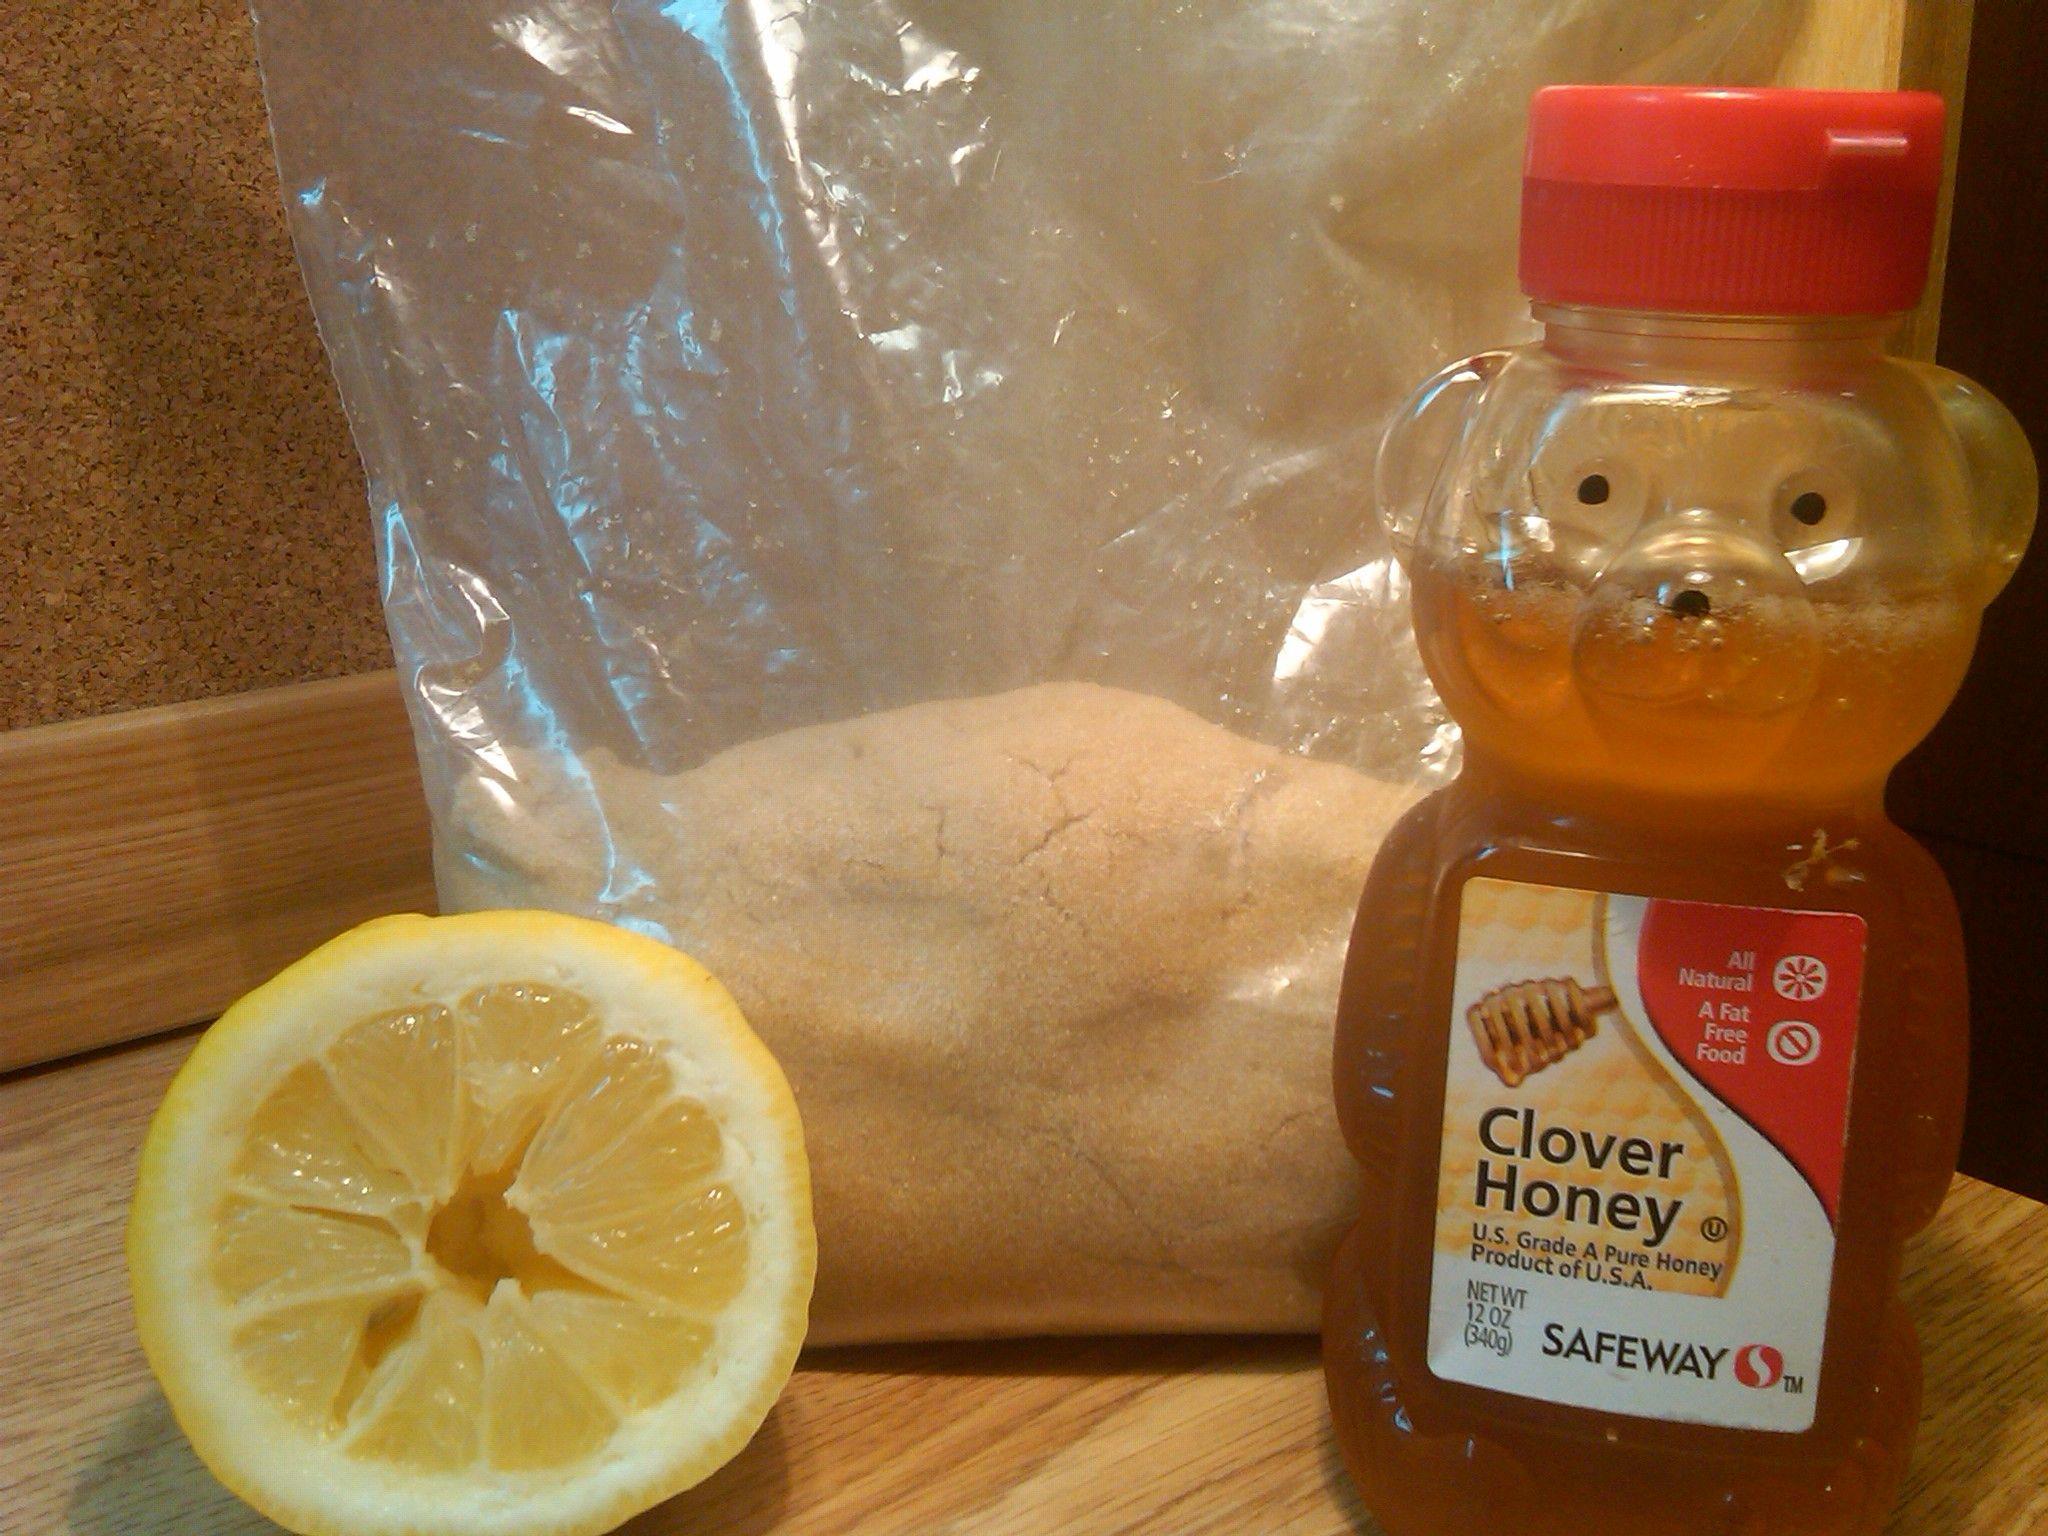 How To Make Homemade Sugar Wax Homemade Sugar Wax Sugar Waxing